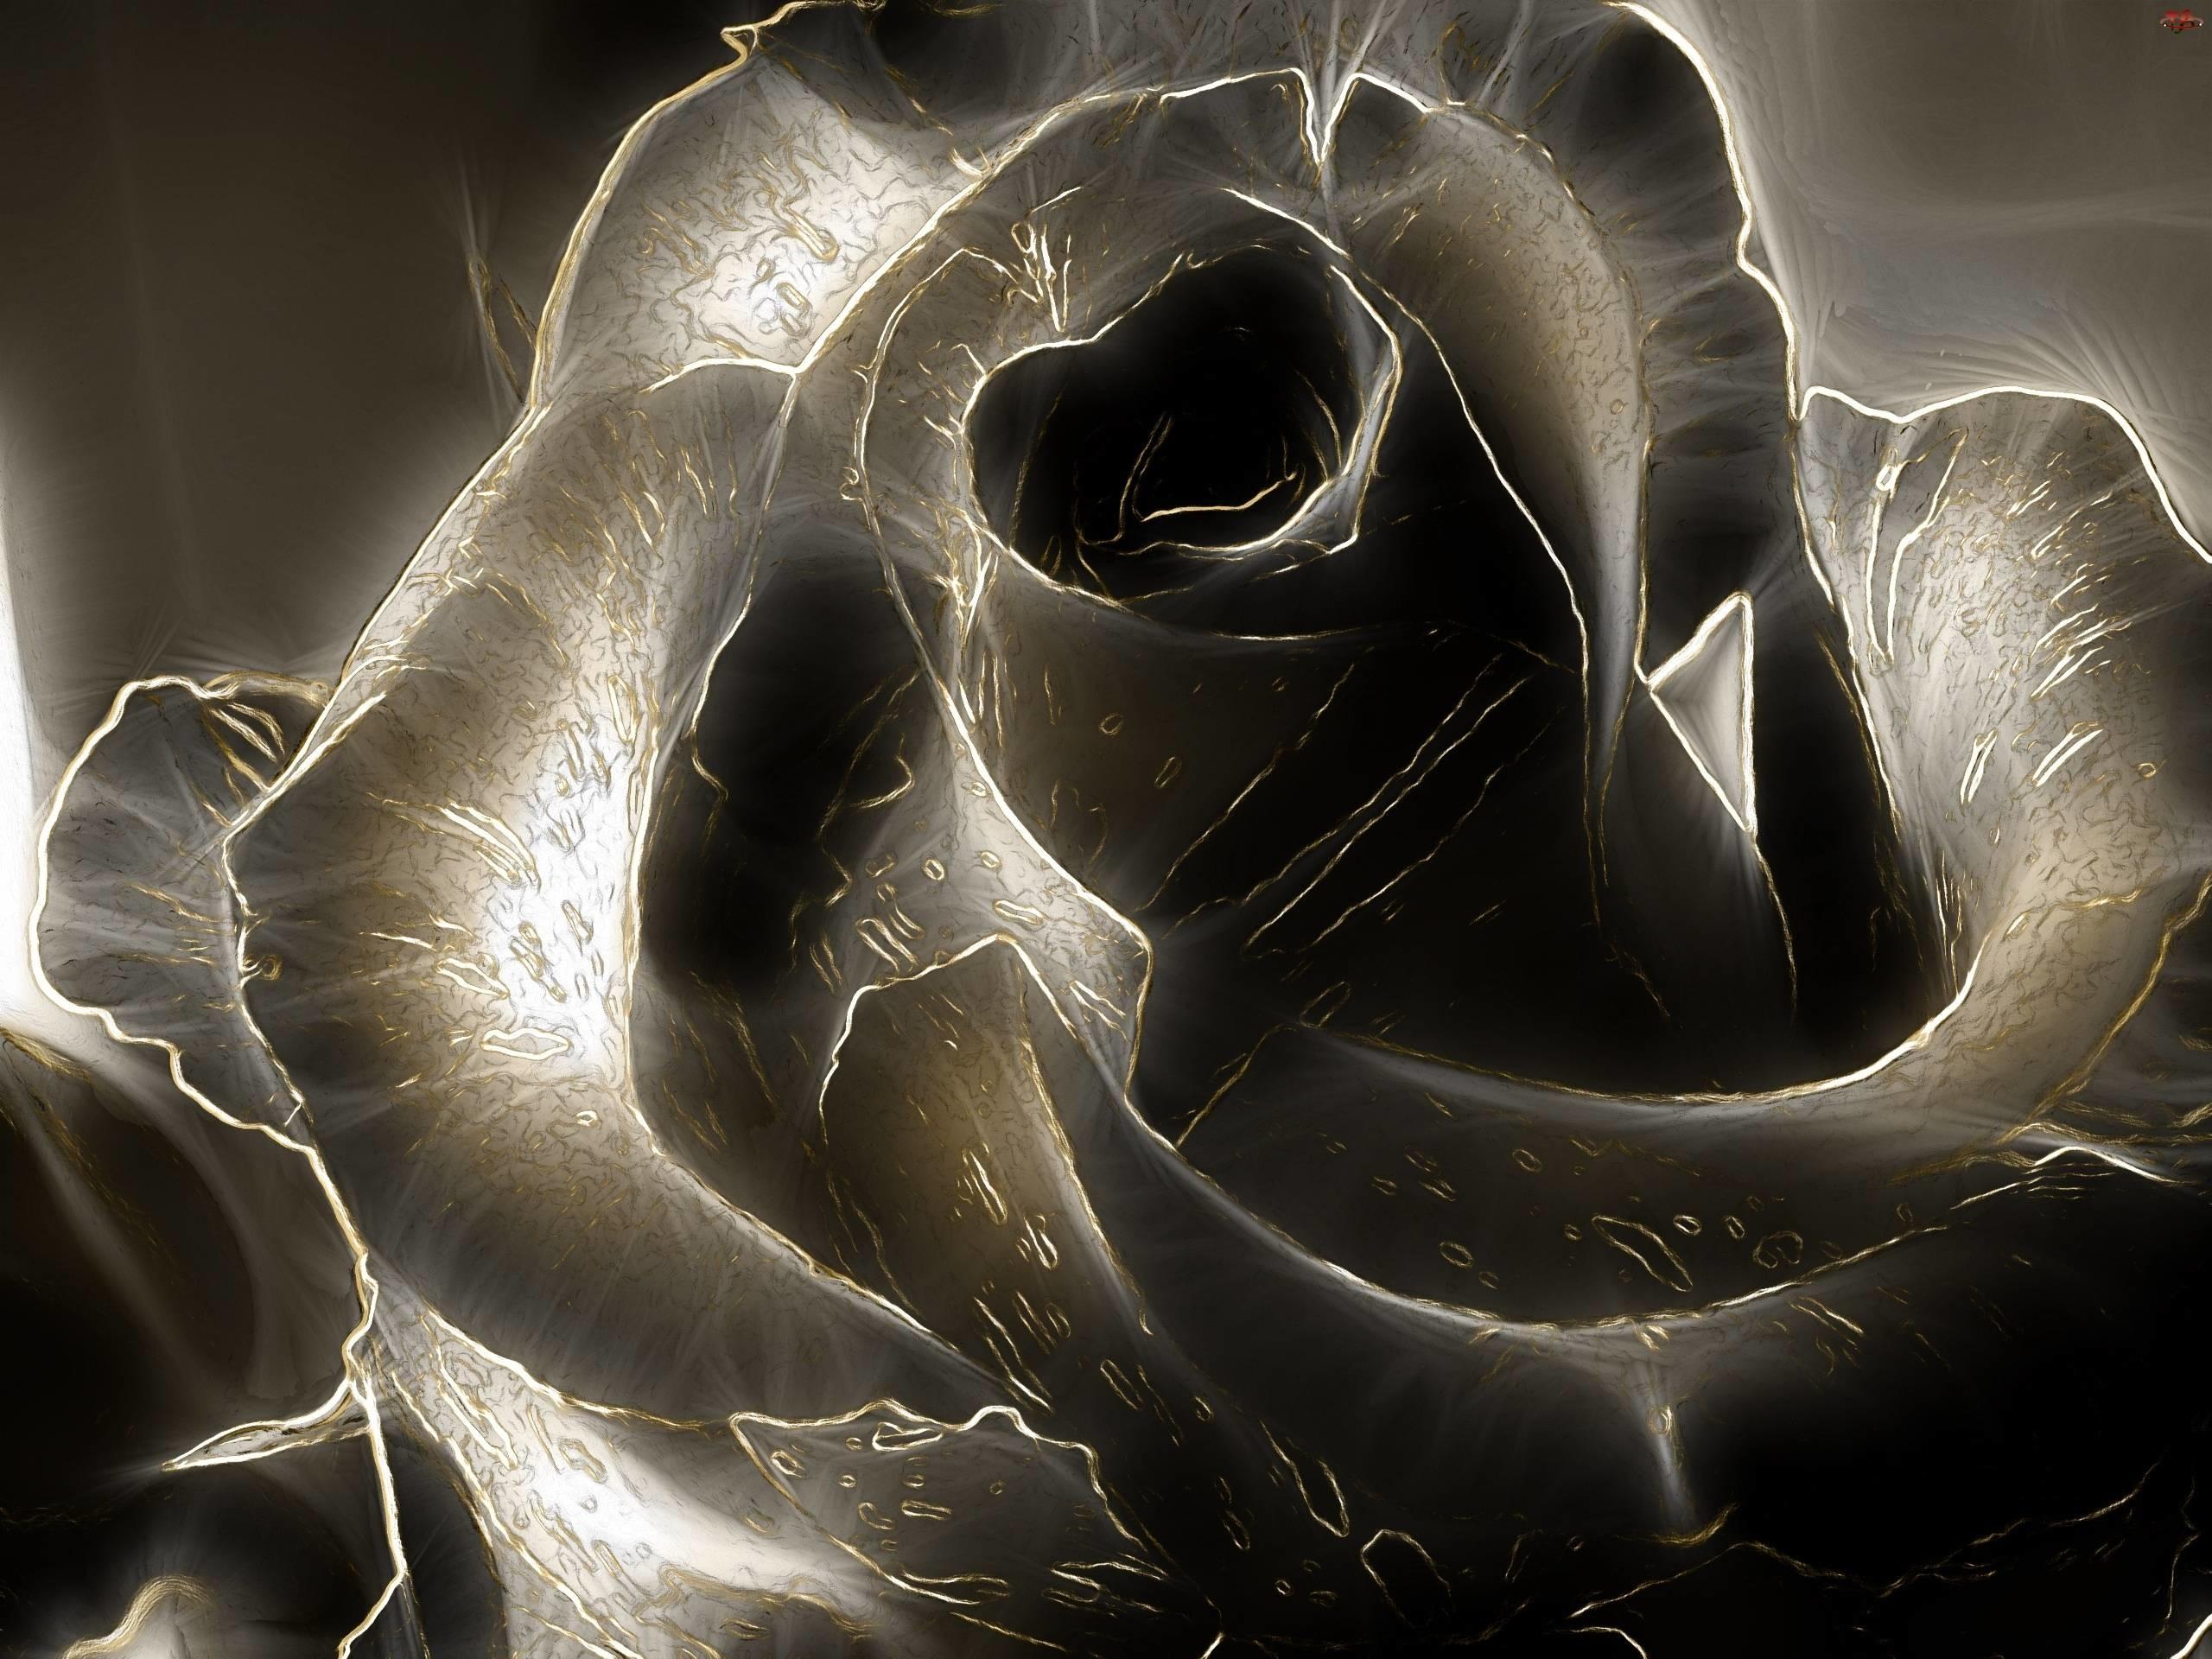 3D Black Rose Image 2206 2560x1920px – HD Wallpaper